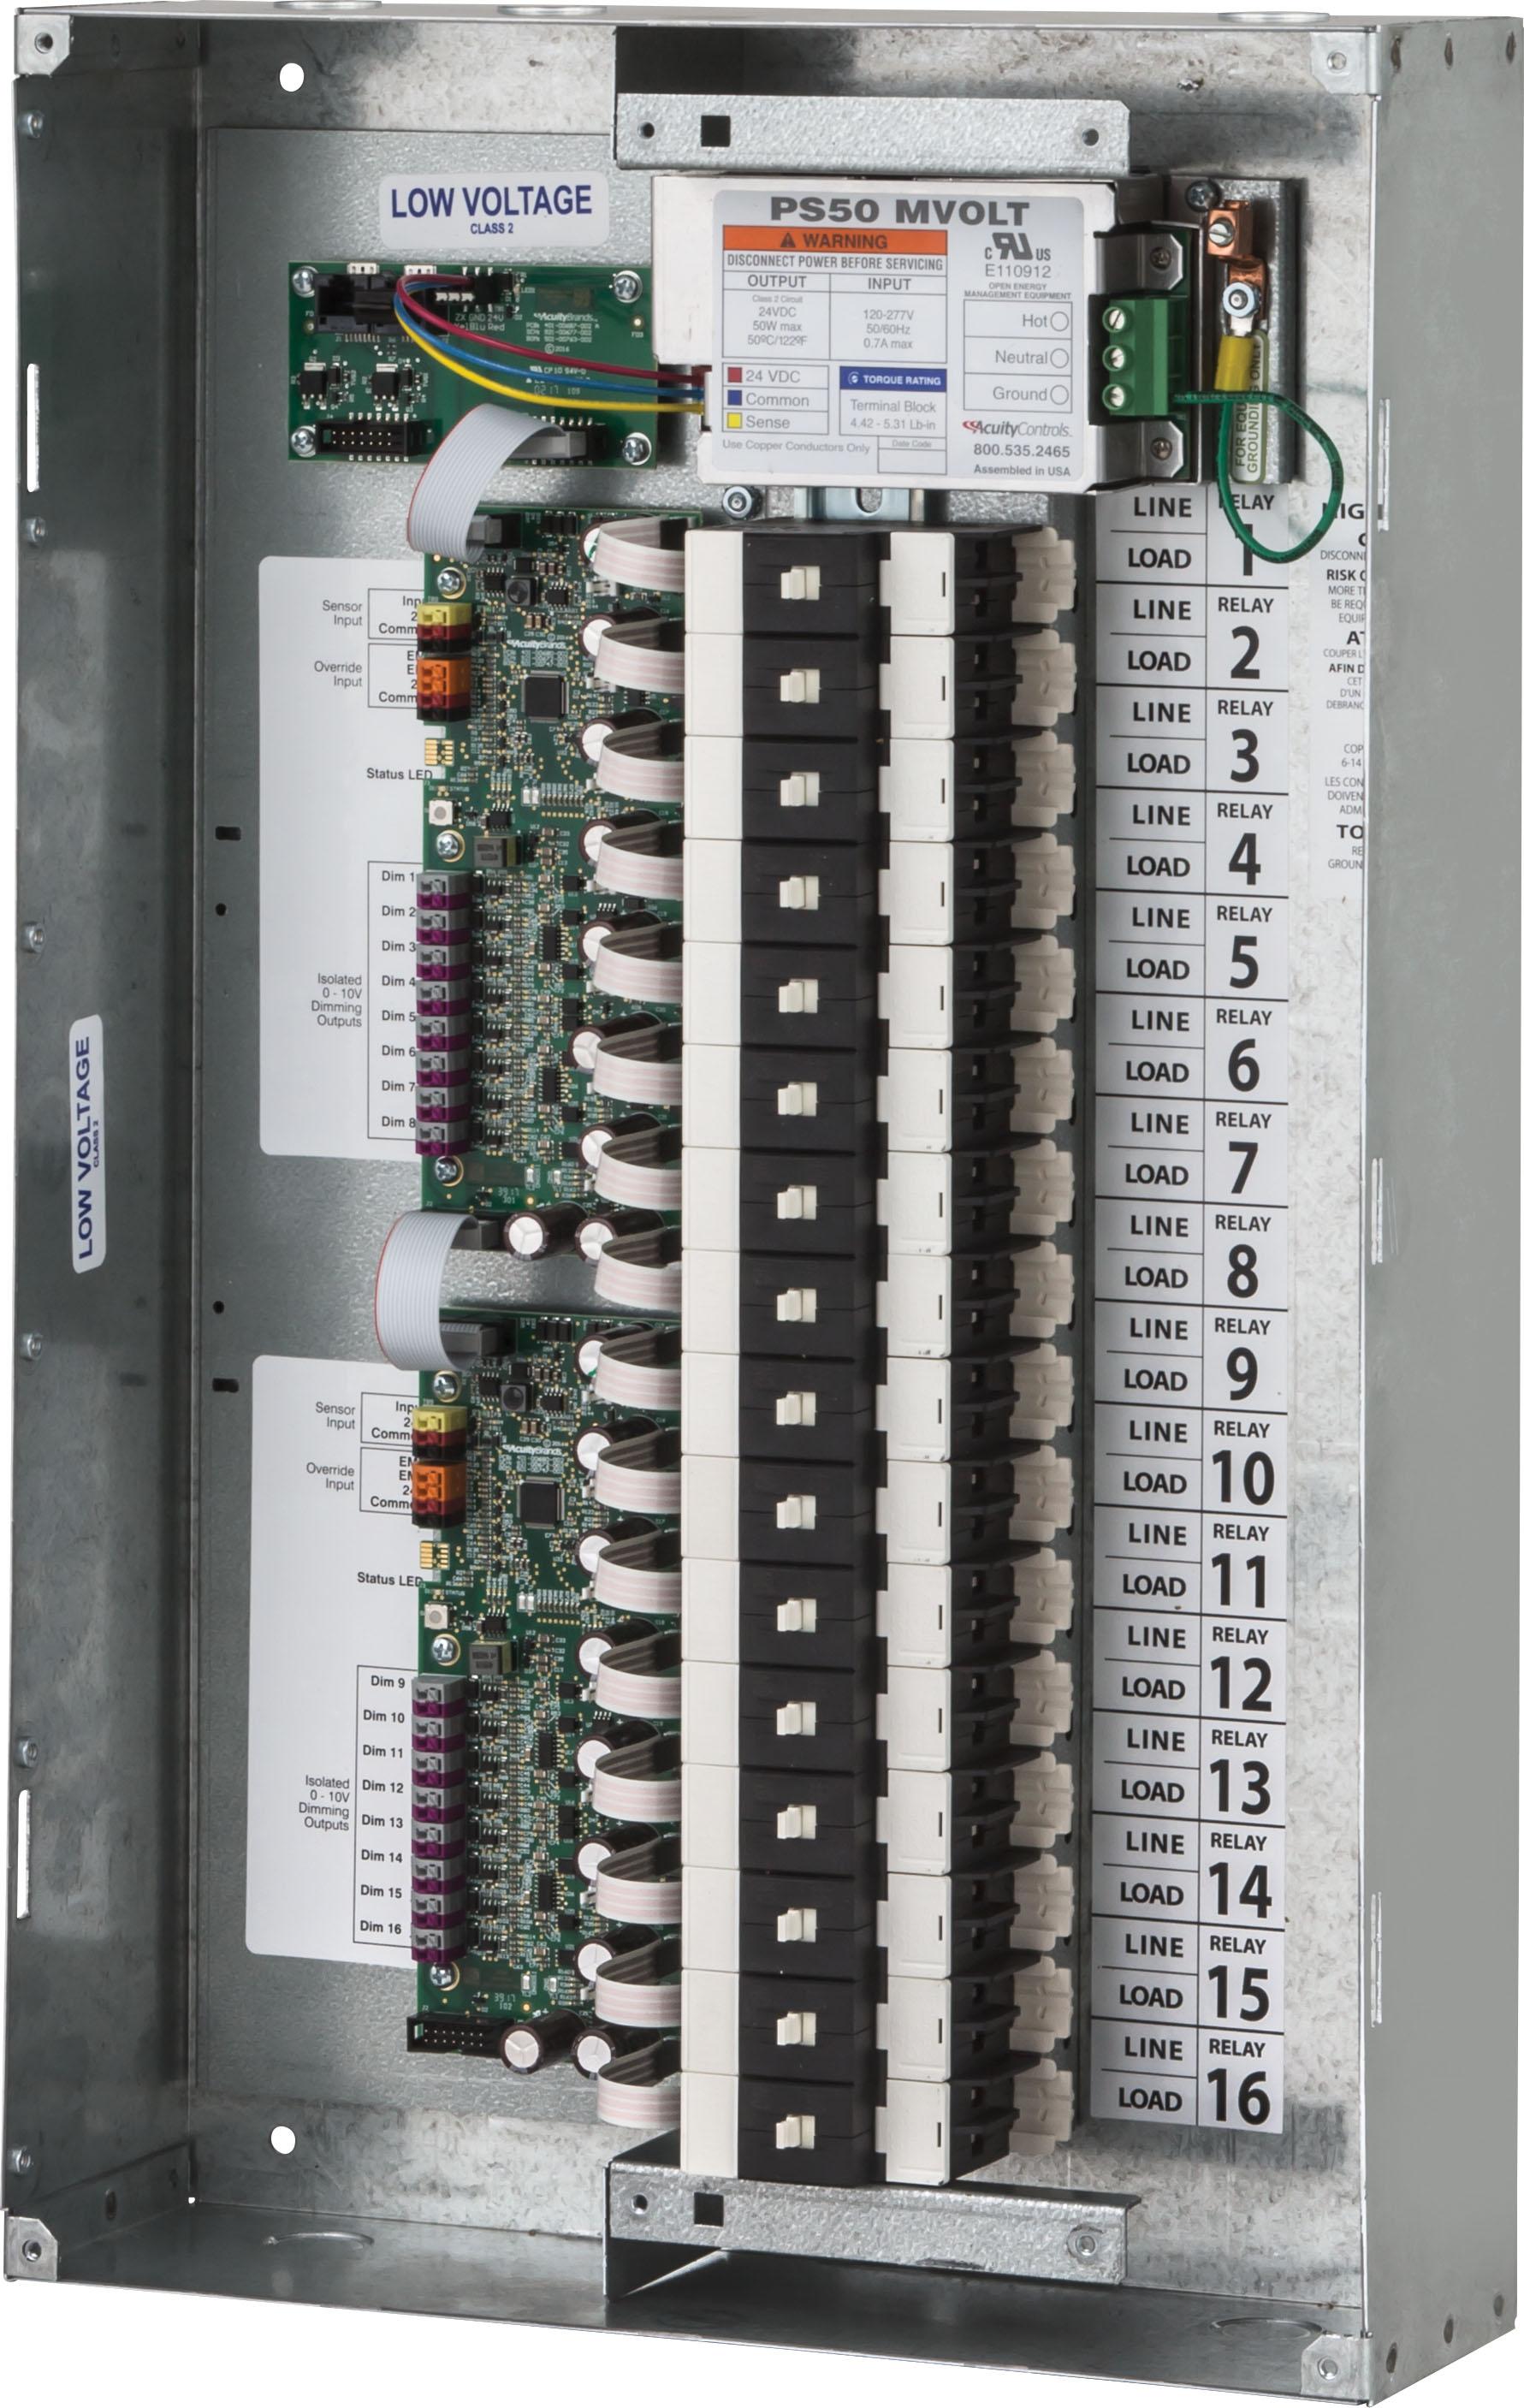 nLight ARP Relay Panel 16 left facing interior sans cover.jpg